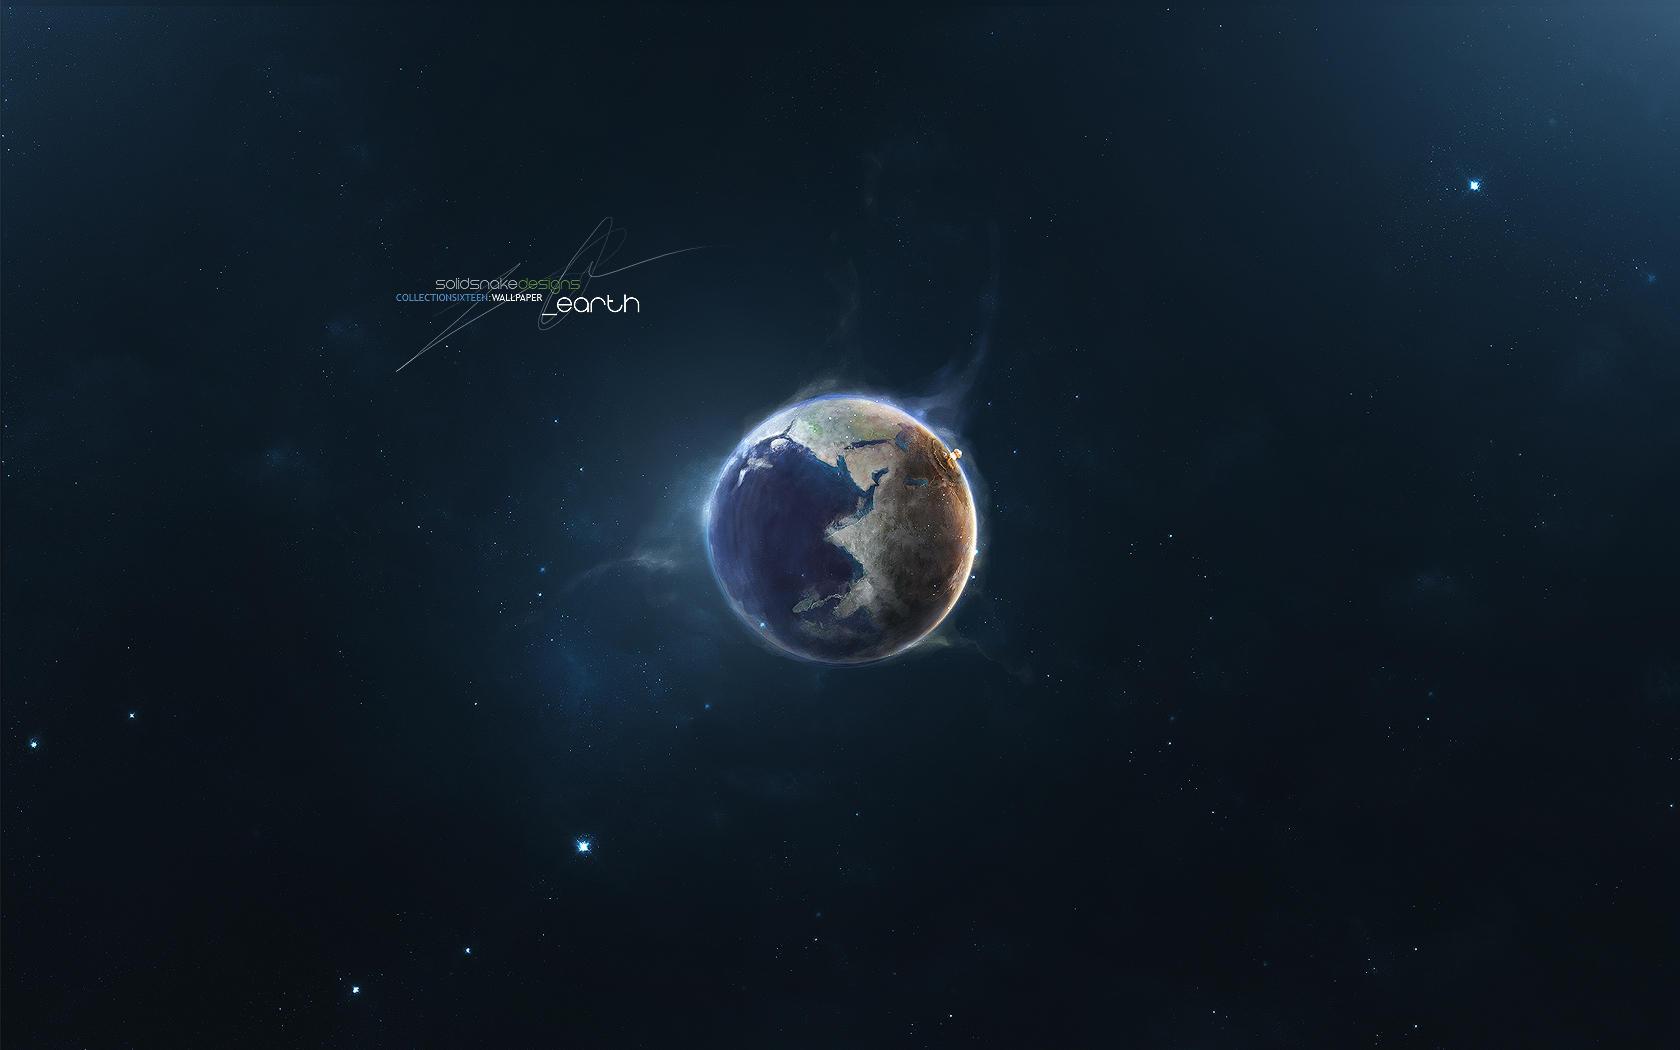 Earth Wallpaper High Resolution Iphone LS